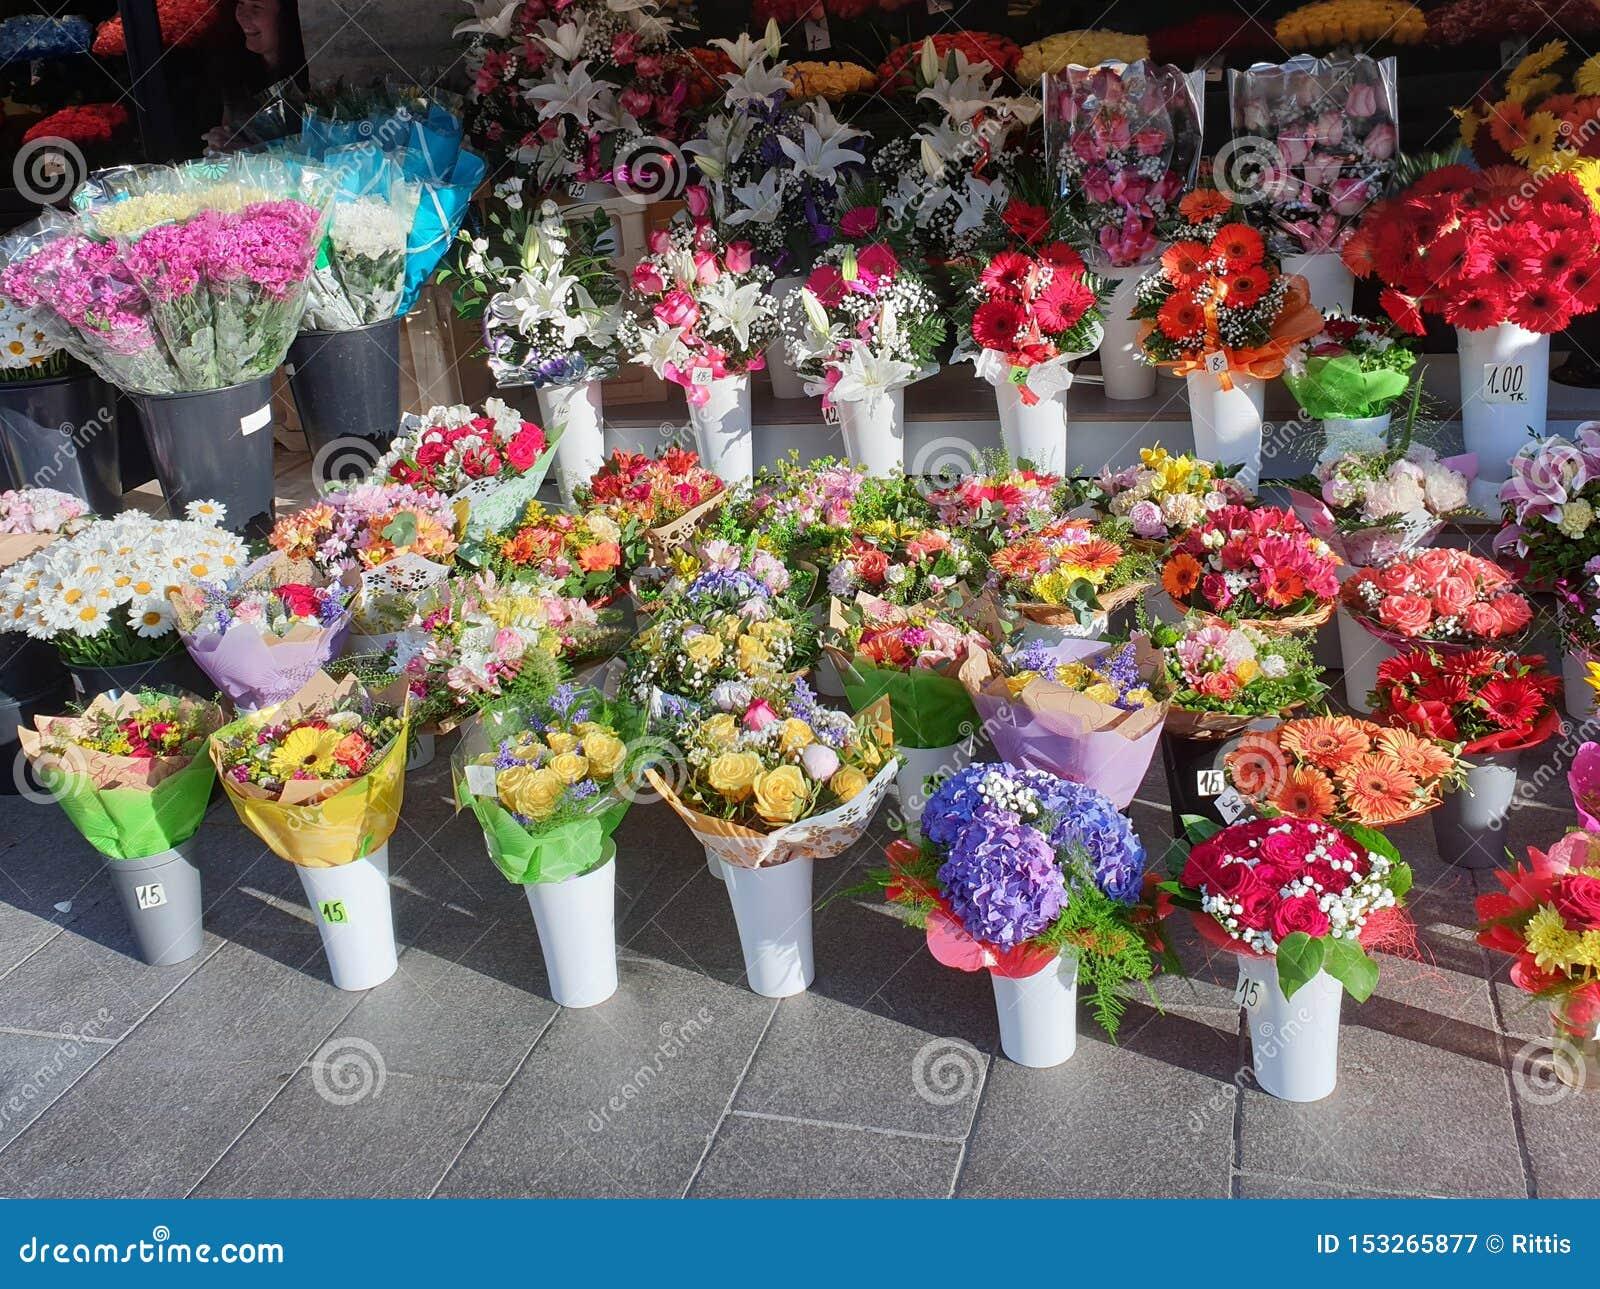 Flower Market In Tallinn Estonia Selling Beautiful Bouquets Stock Image Image Of Bouquets Diversity 153265877